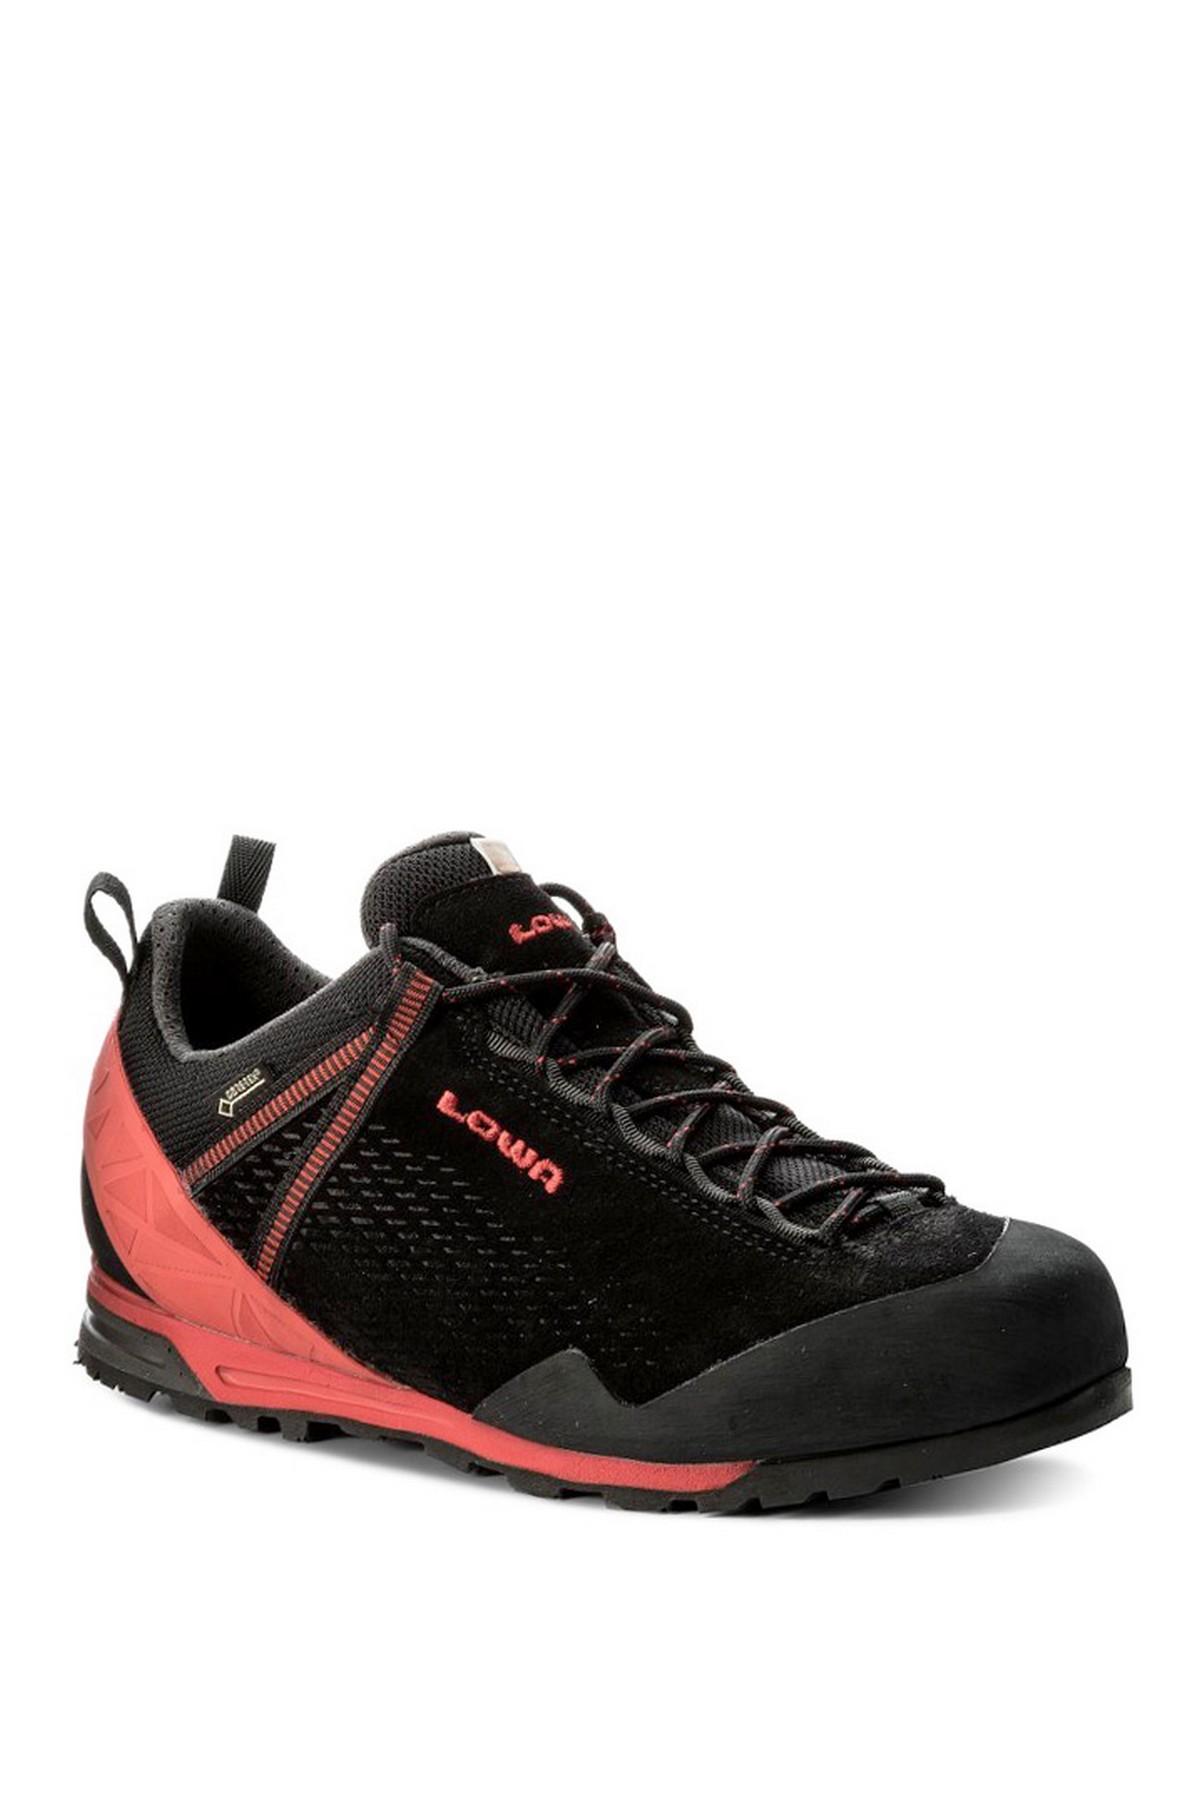 LOWA Ticino GTX Outdoor Ayakkabı (210745-9901)